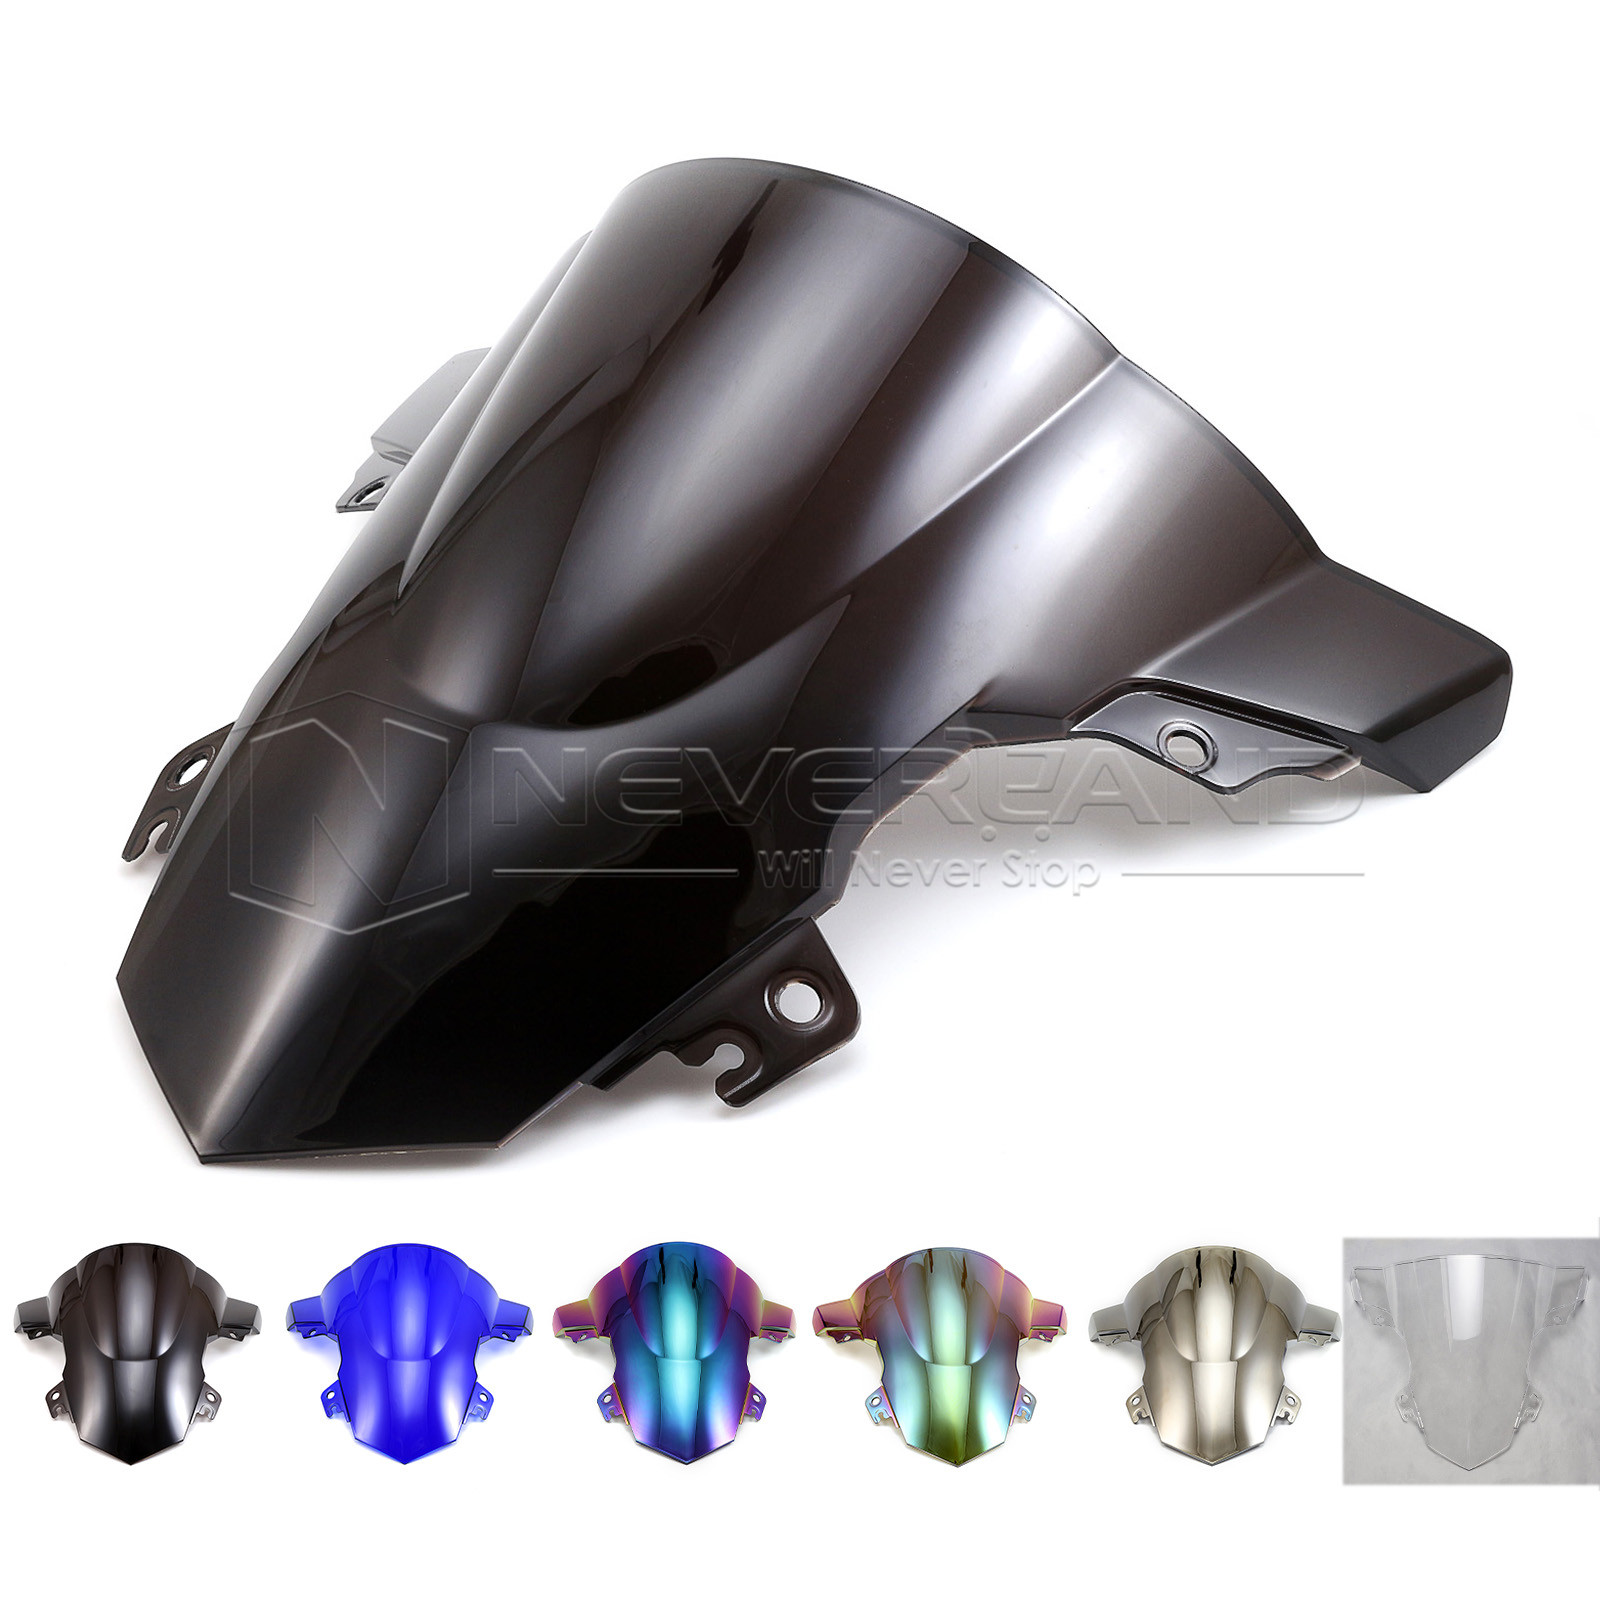 online get cheap bmw motorcycle windshields -aliexpress